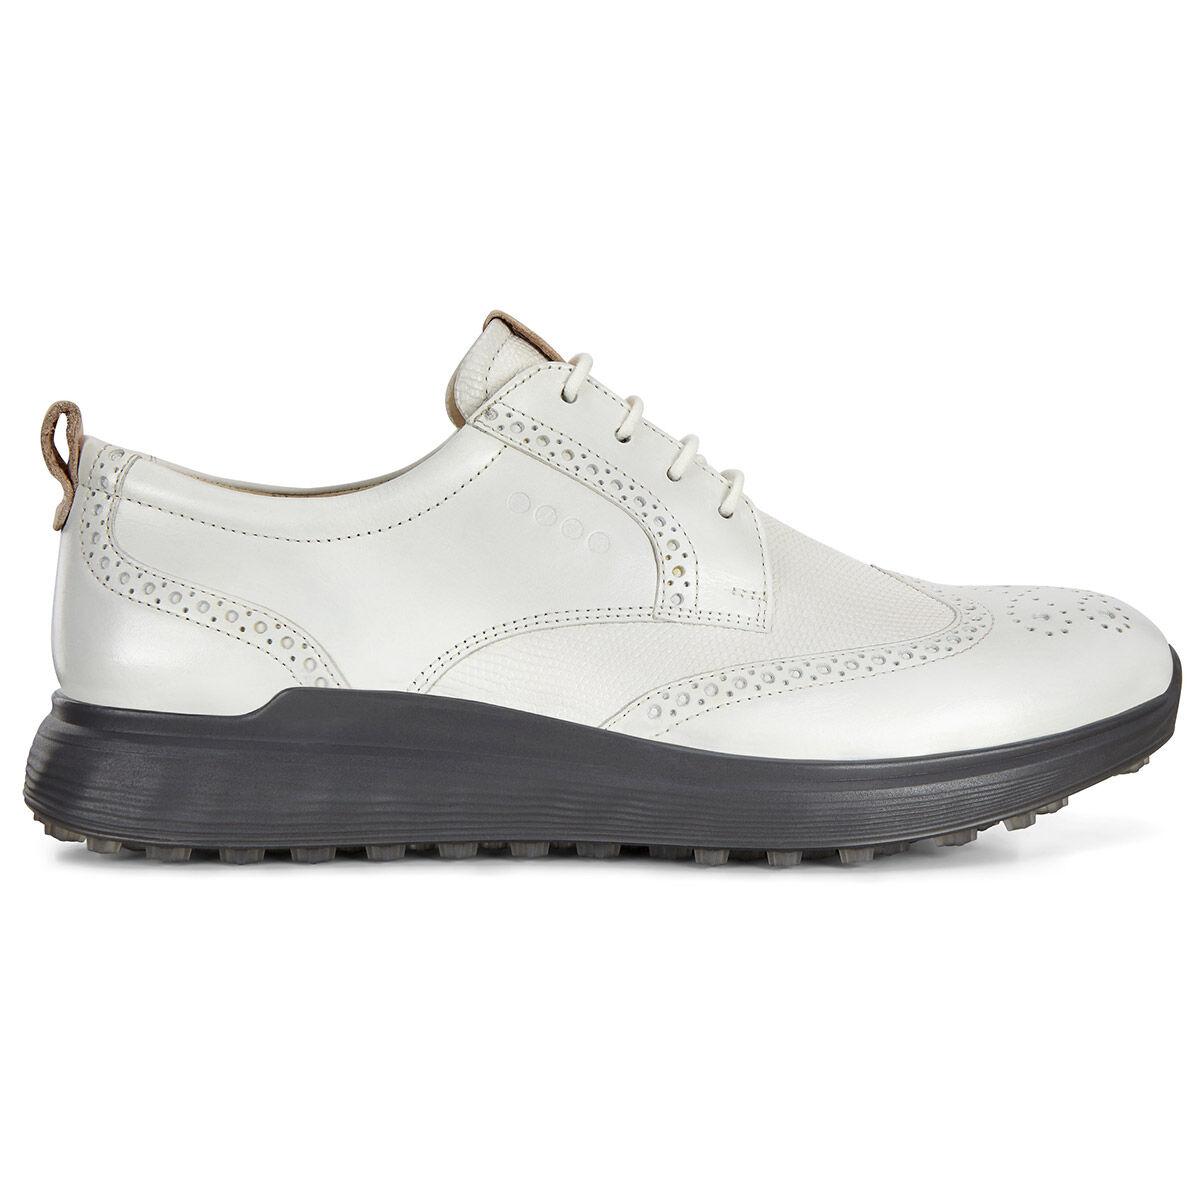 ECCO Golf S Classic Shoes